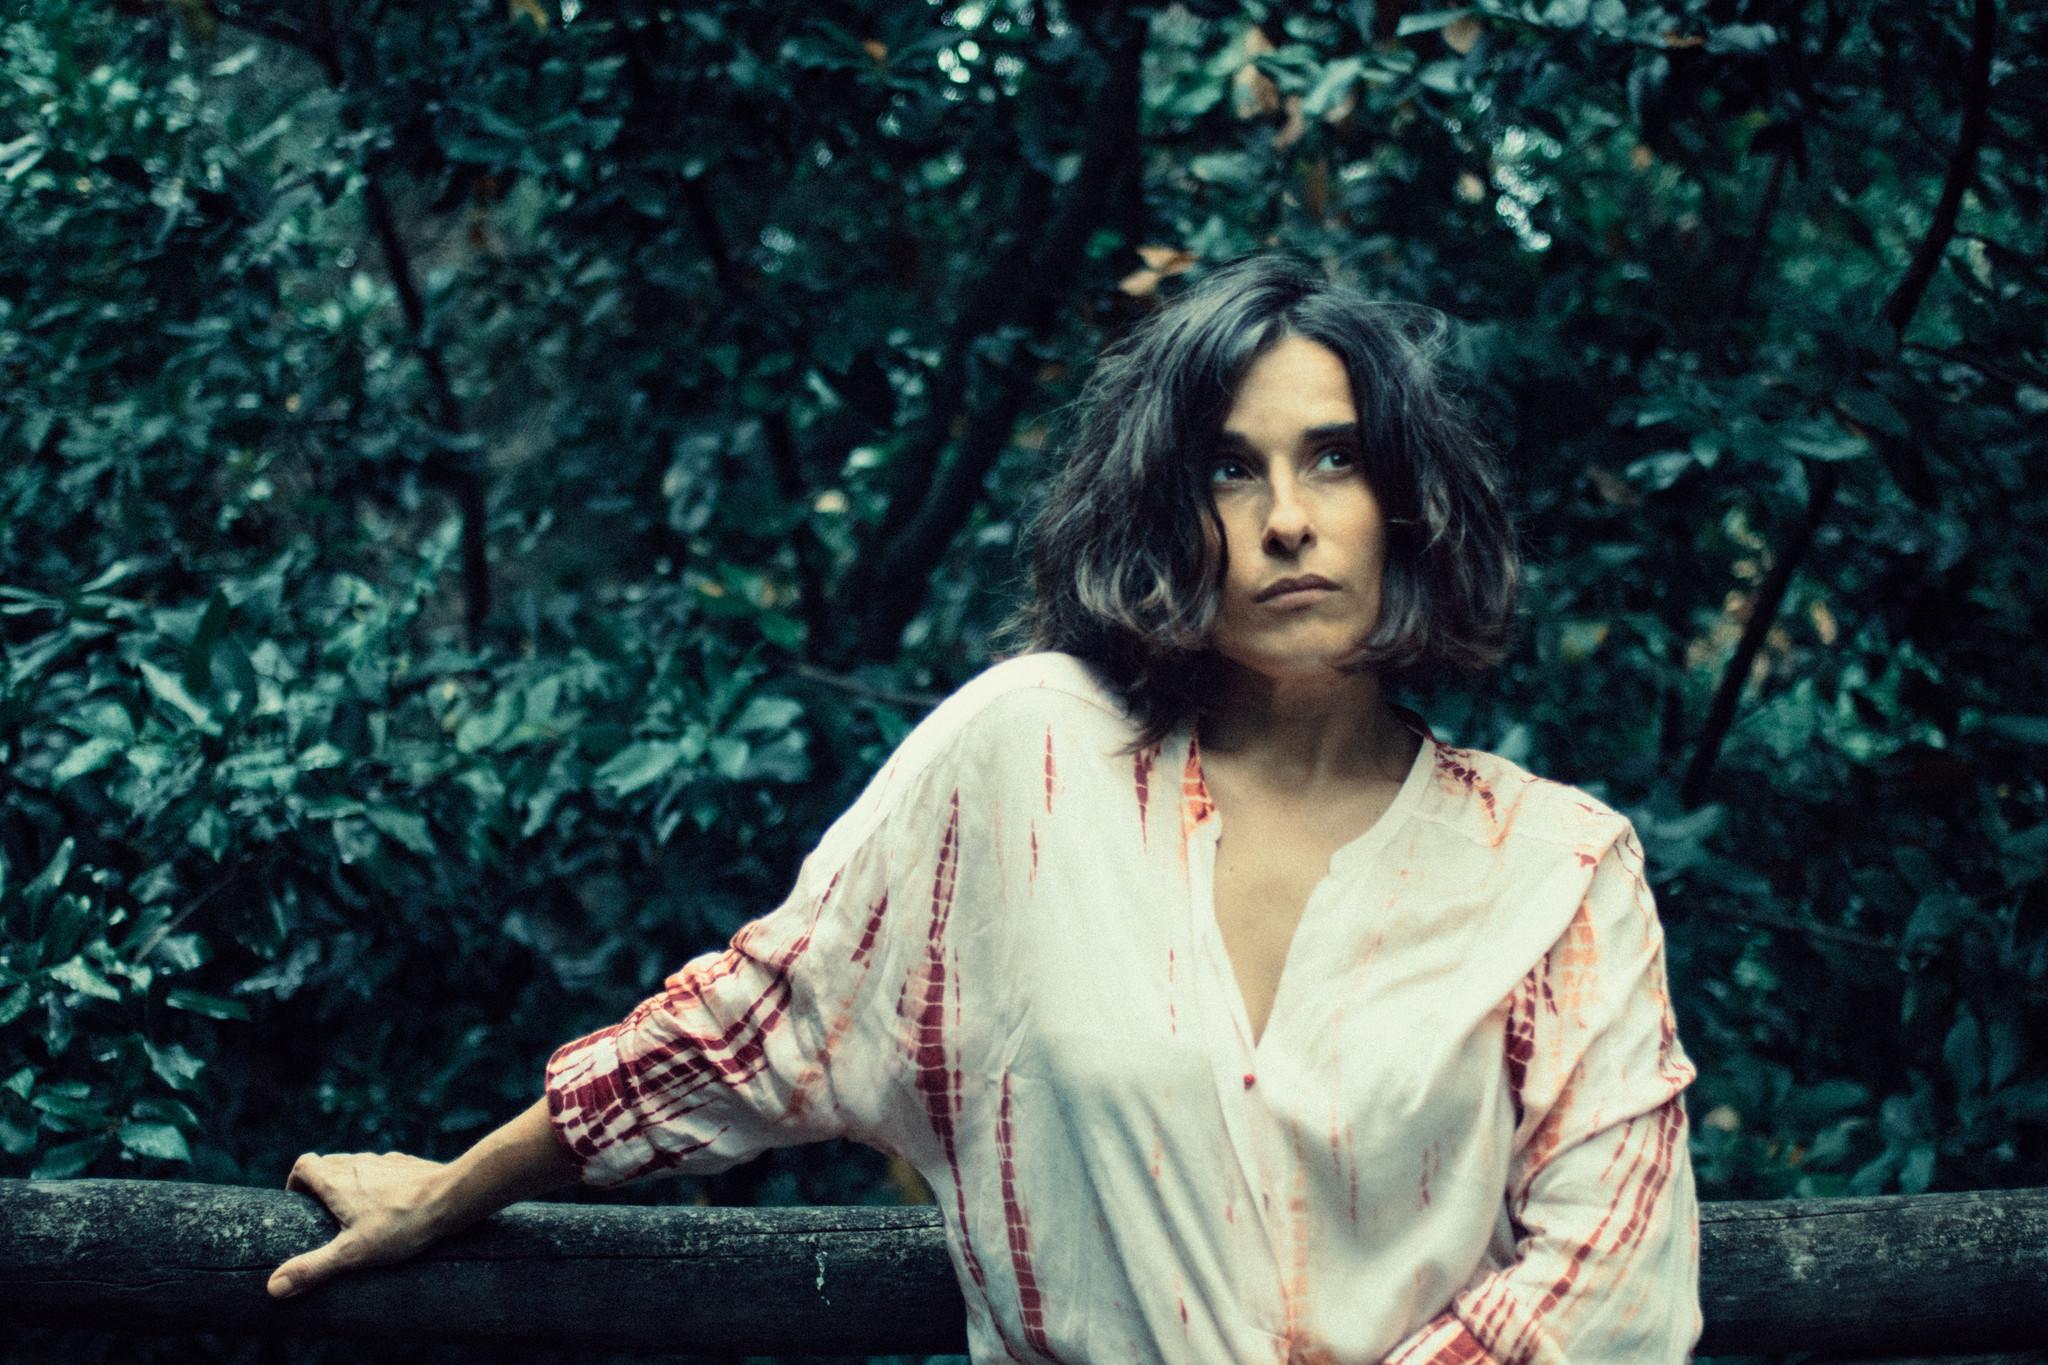 Cristina Branco 2018(c )JoanaLinda - Biblioteca dos Músicos.jpg